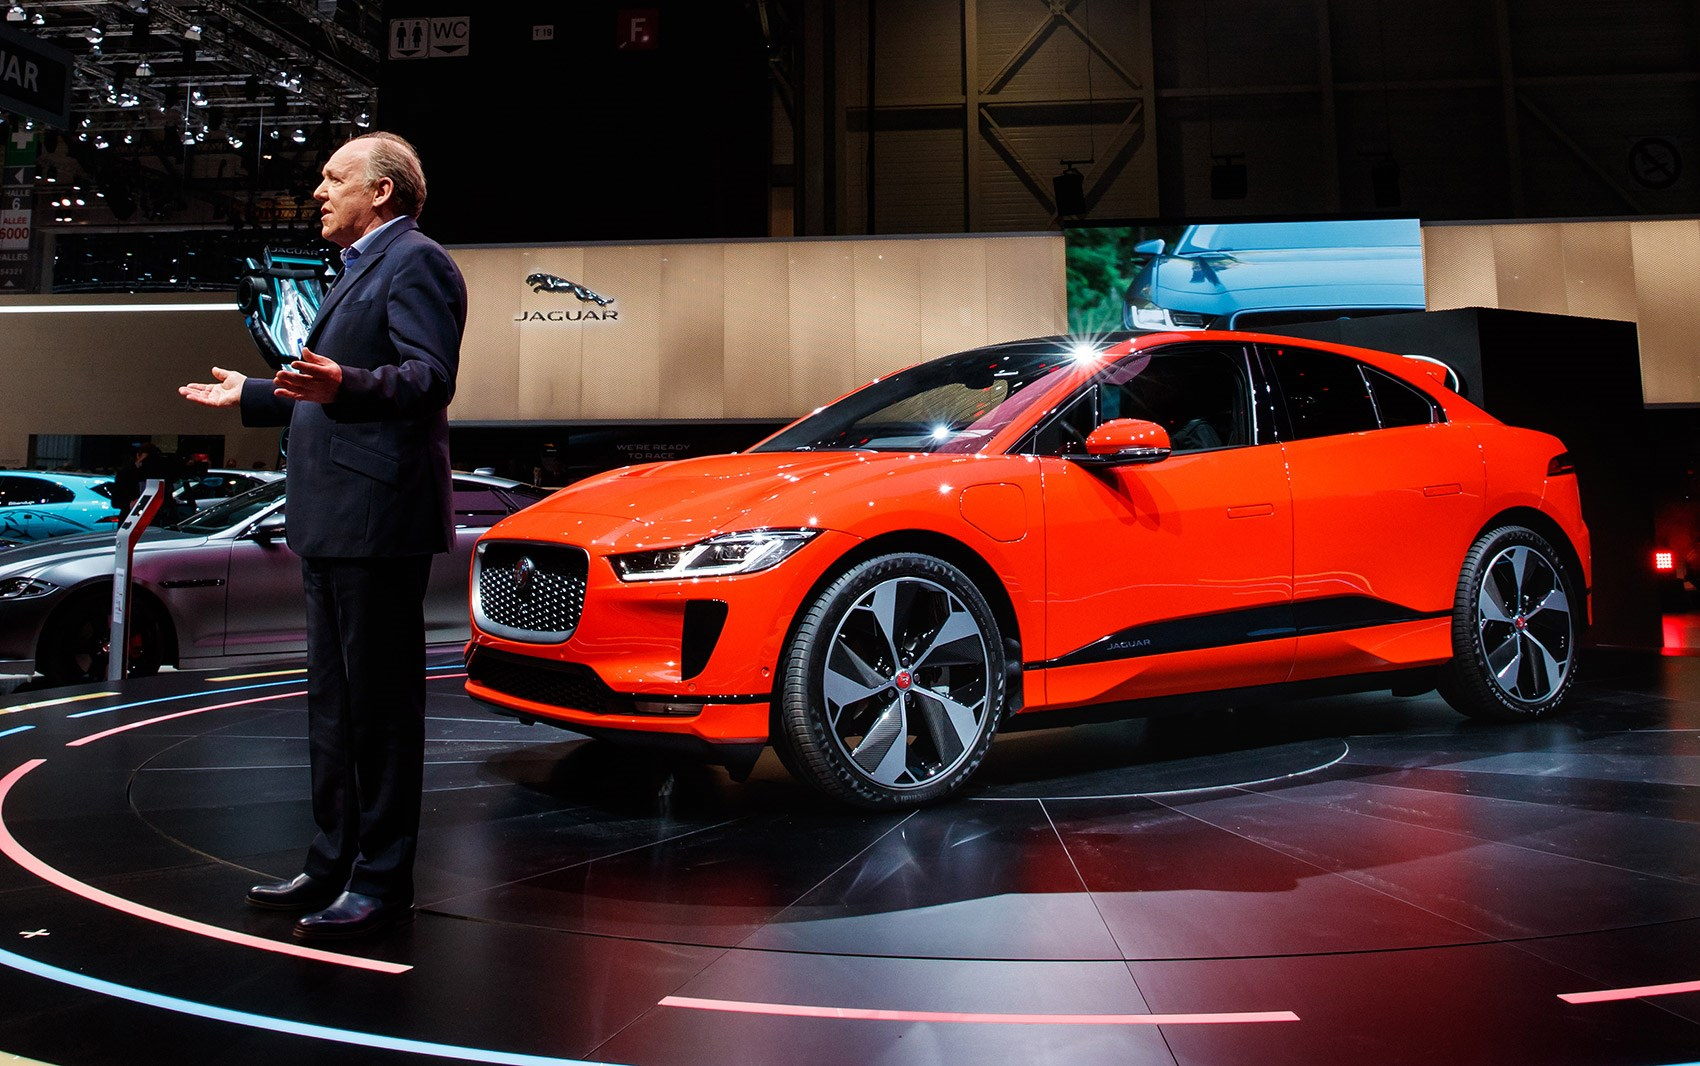 2019 Jaguar I-Pace EV: Design, Specs, Mileage, Price >> Jaguar I Pace Electric Suv News Specs Prices Uk On Sale Dates